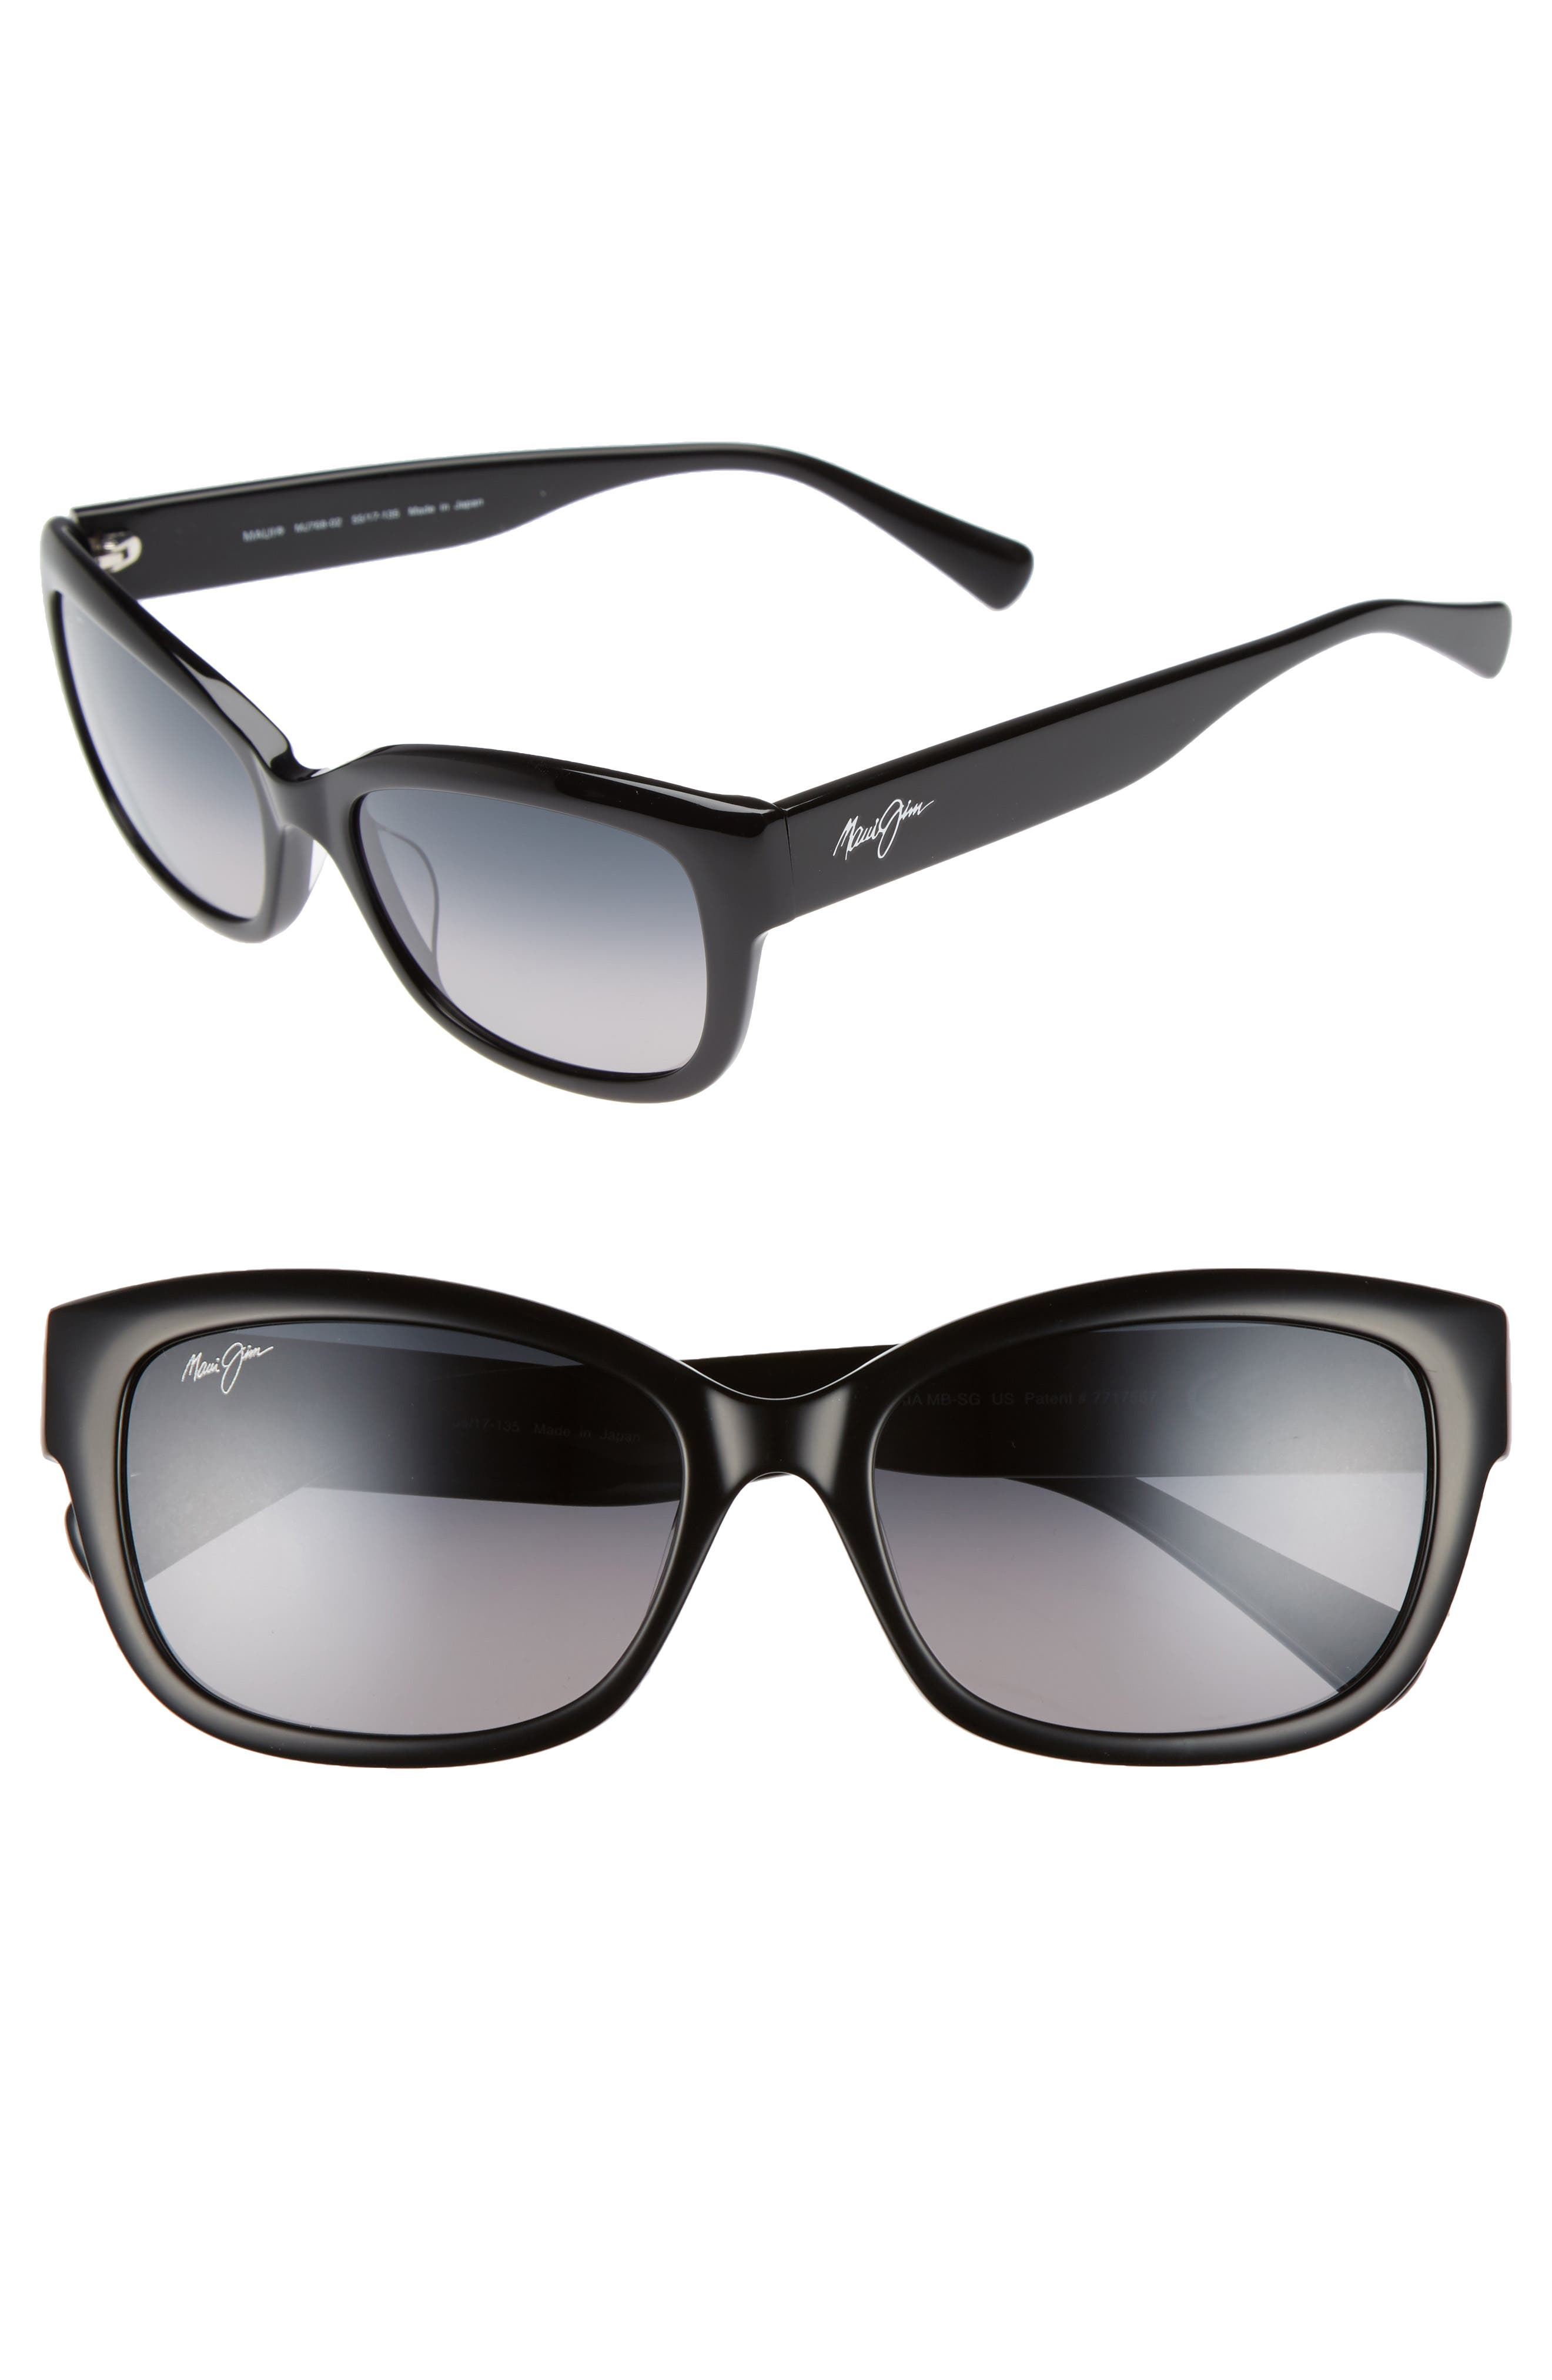 Plumeria 55mm Polarized Cat Eye Sunglasses,                             Main thumbnail 1, color,                             Gloss Black/ Neutral Grey